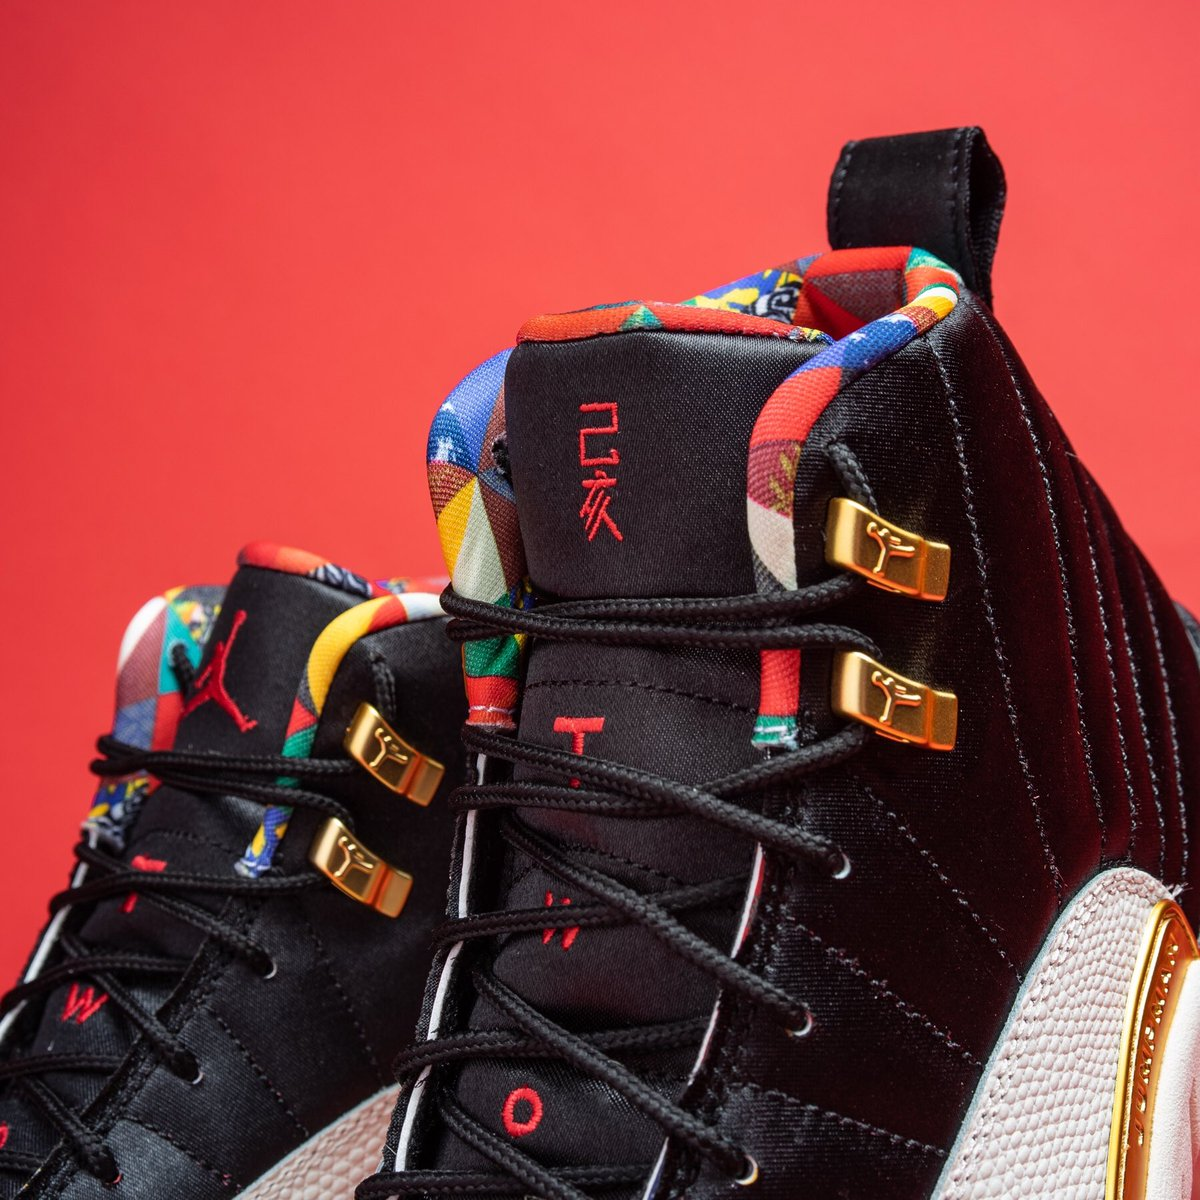 732c7541fb4 ... http   www.jimmyjazz.com girls footwear jordan-retro-12-cny BQ6498-600 color Multi-Color  … ...